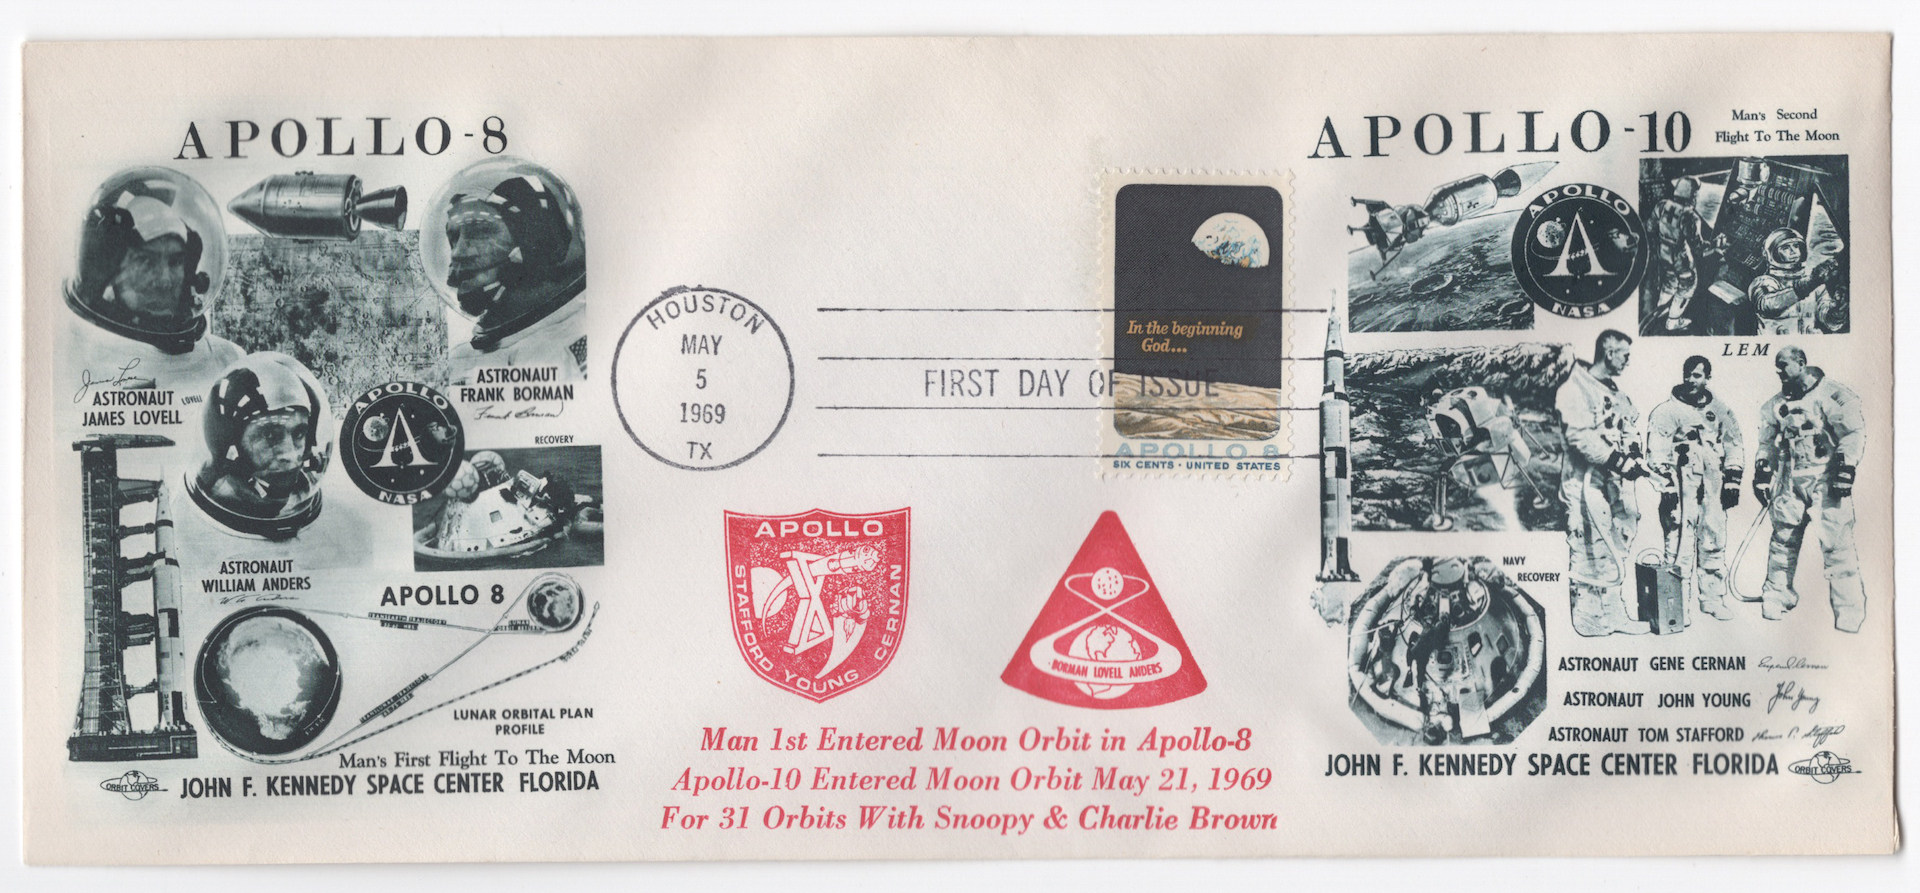 ERM-1968-ENVELOPE-HOUSTON_MAY_5_1969.jpg